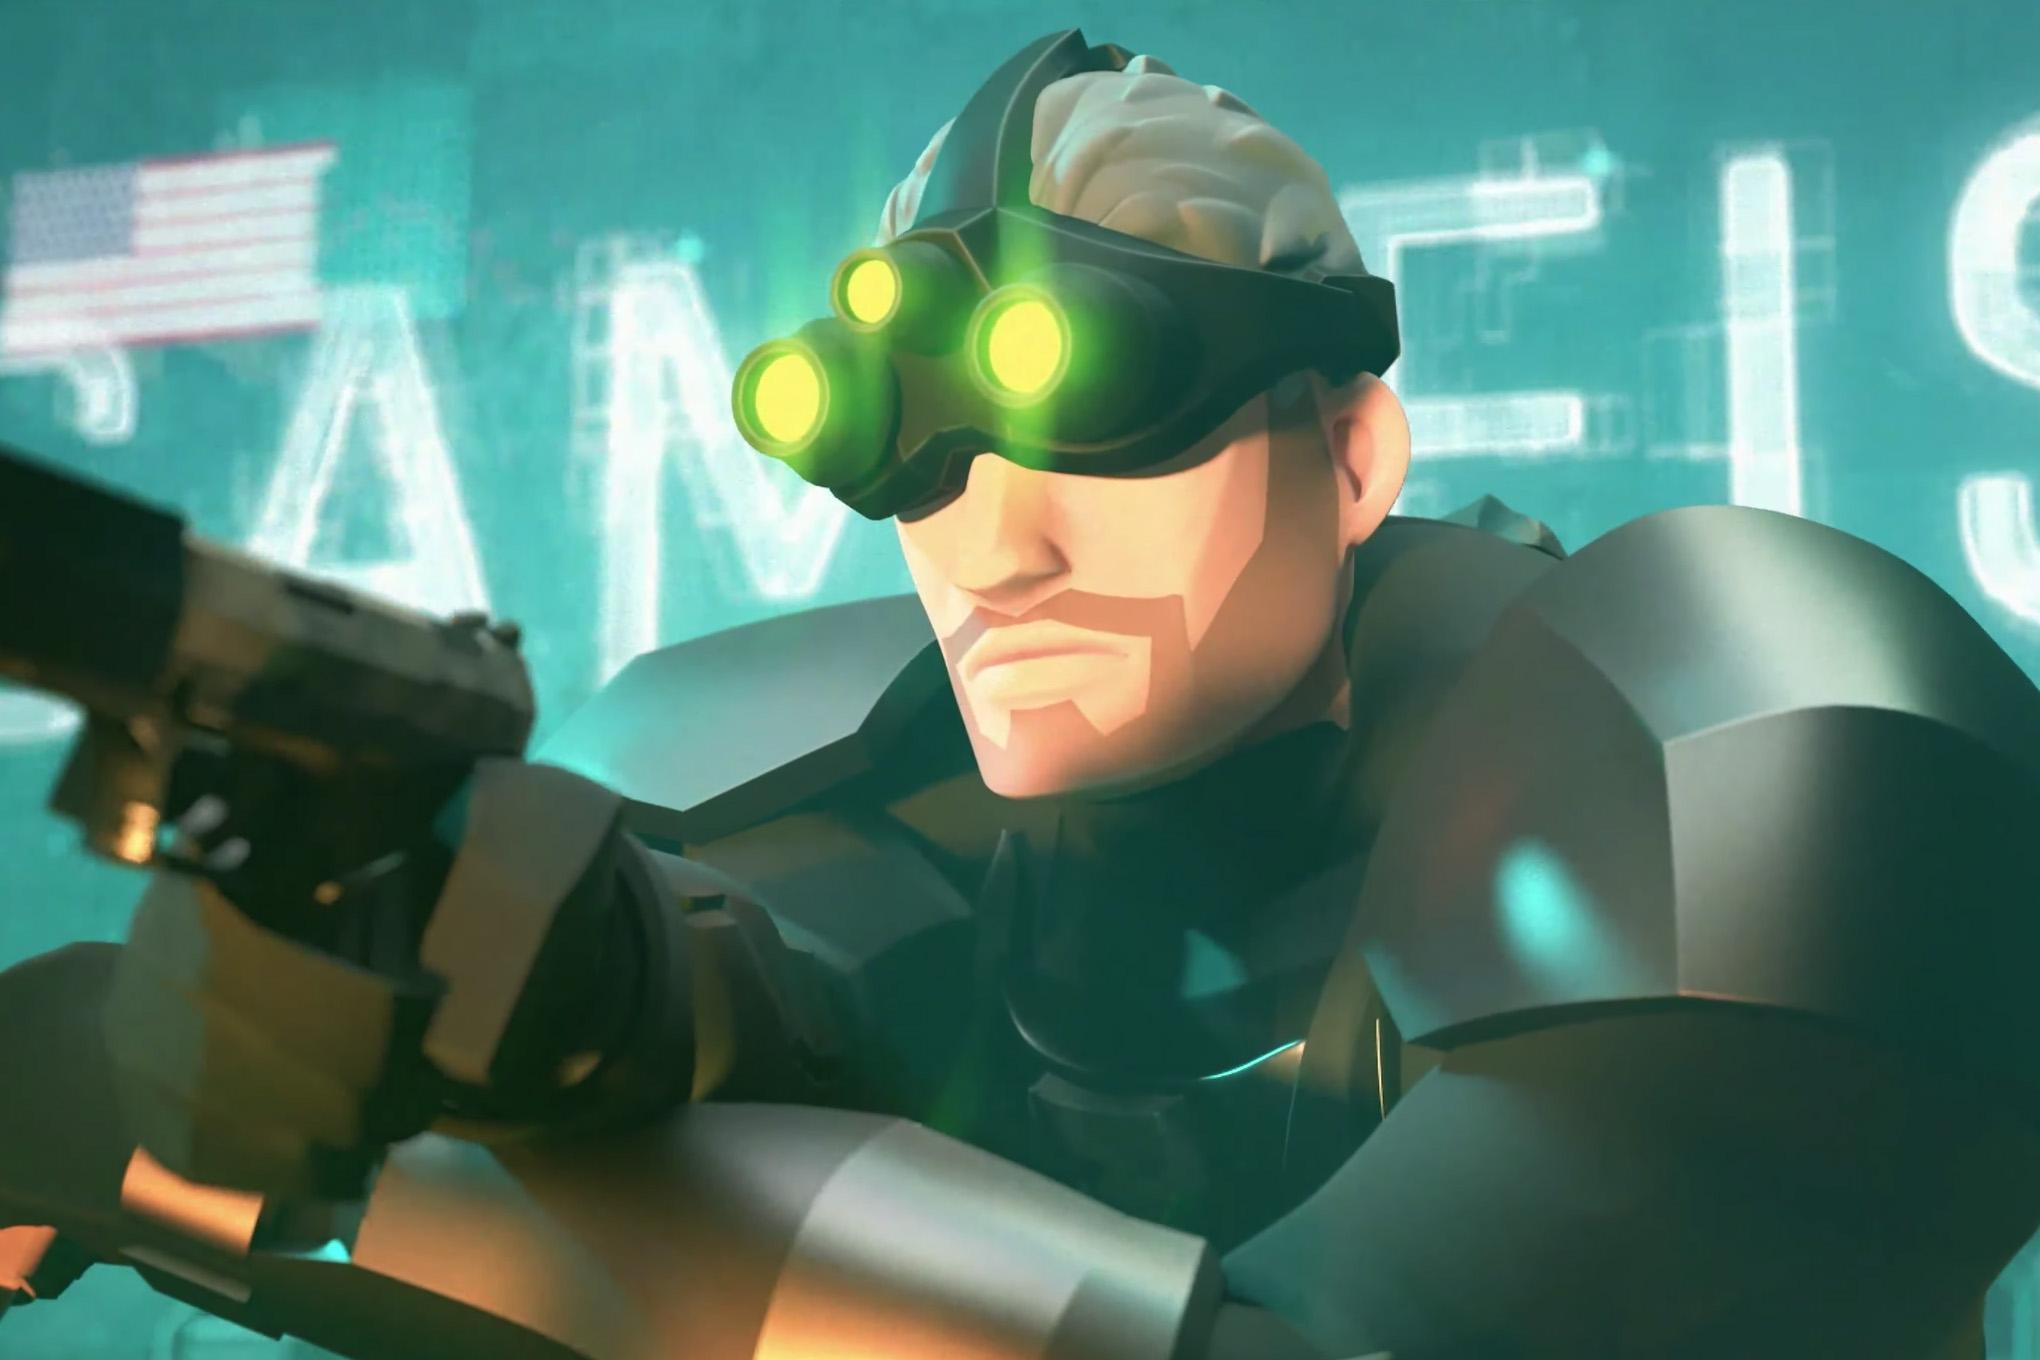 Tom Clancy's Elite Squad unites multiple Ubisoft franchises